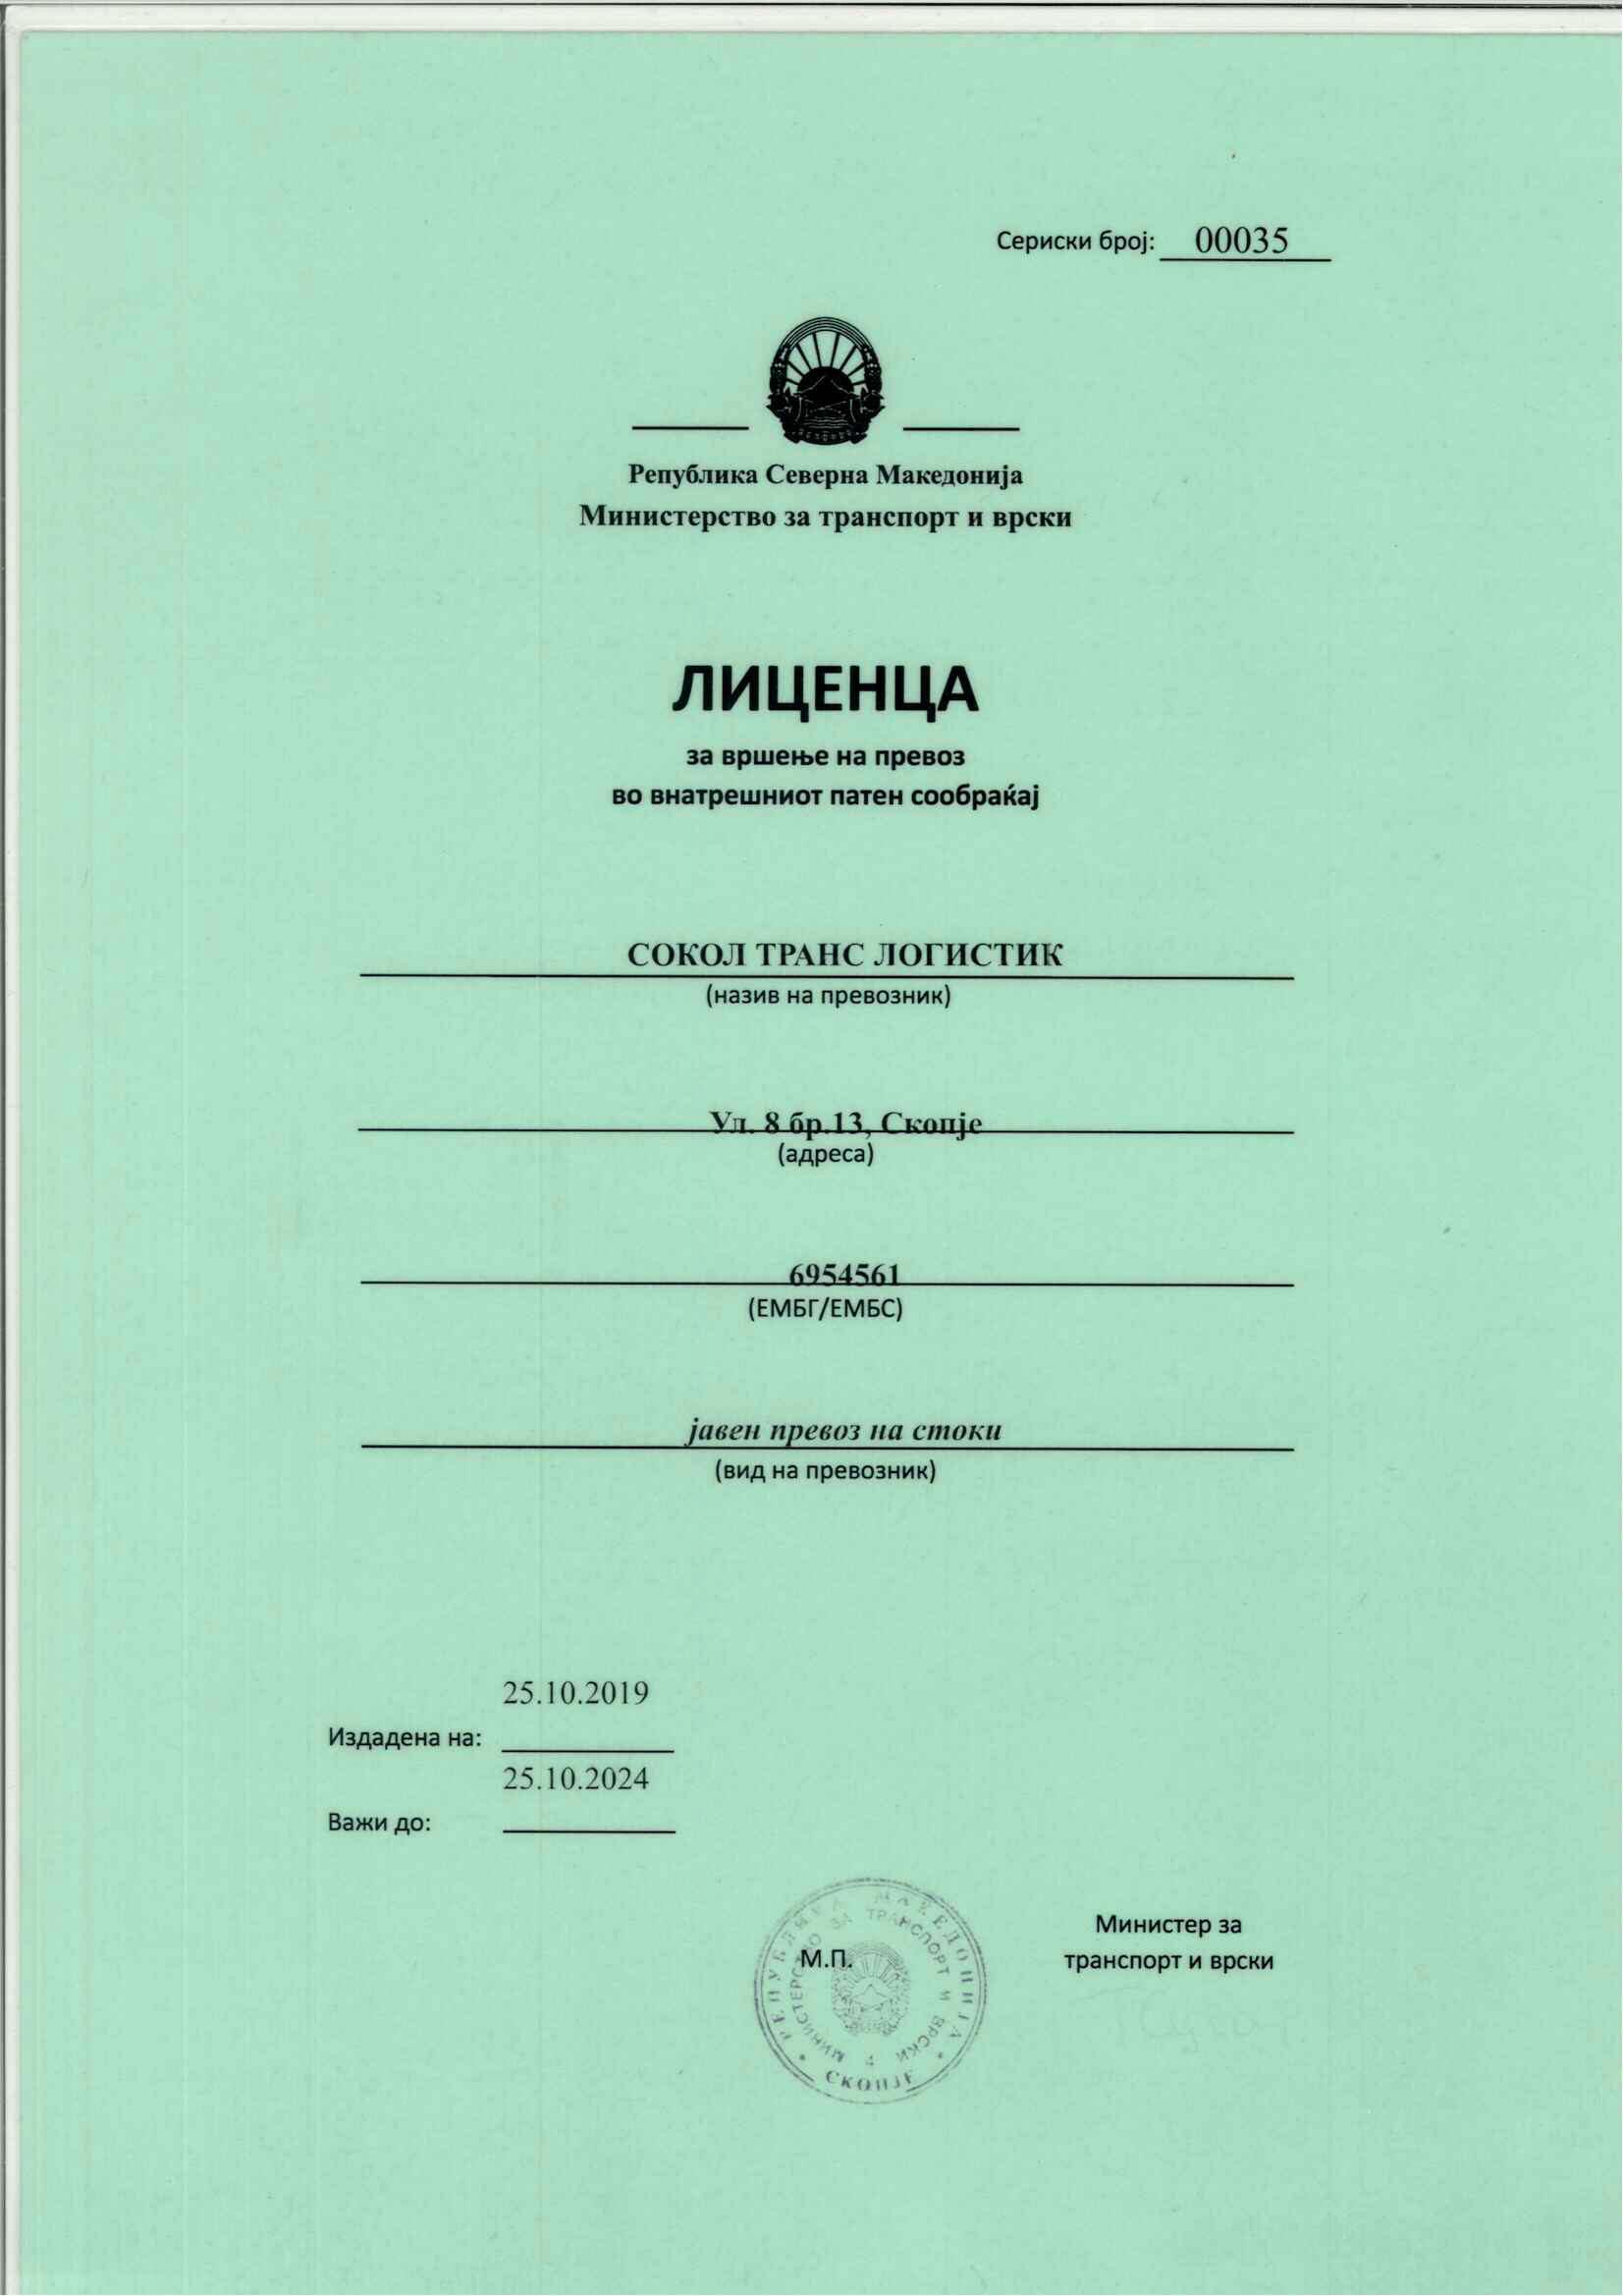 Certificat 1